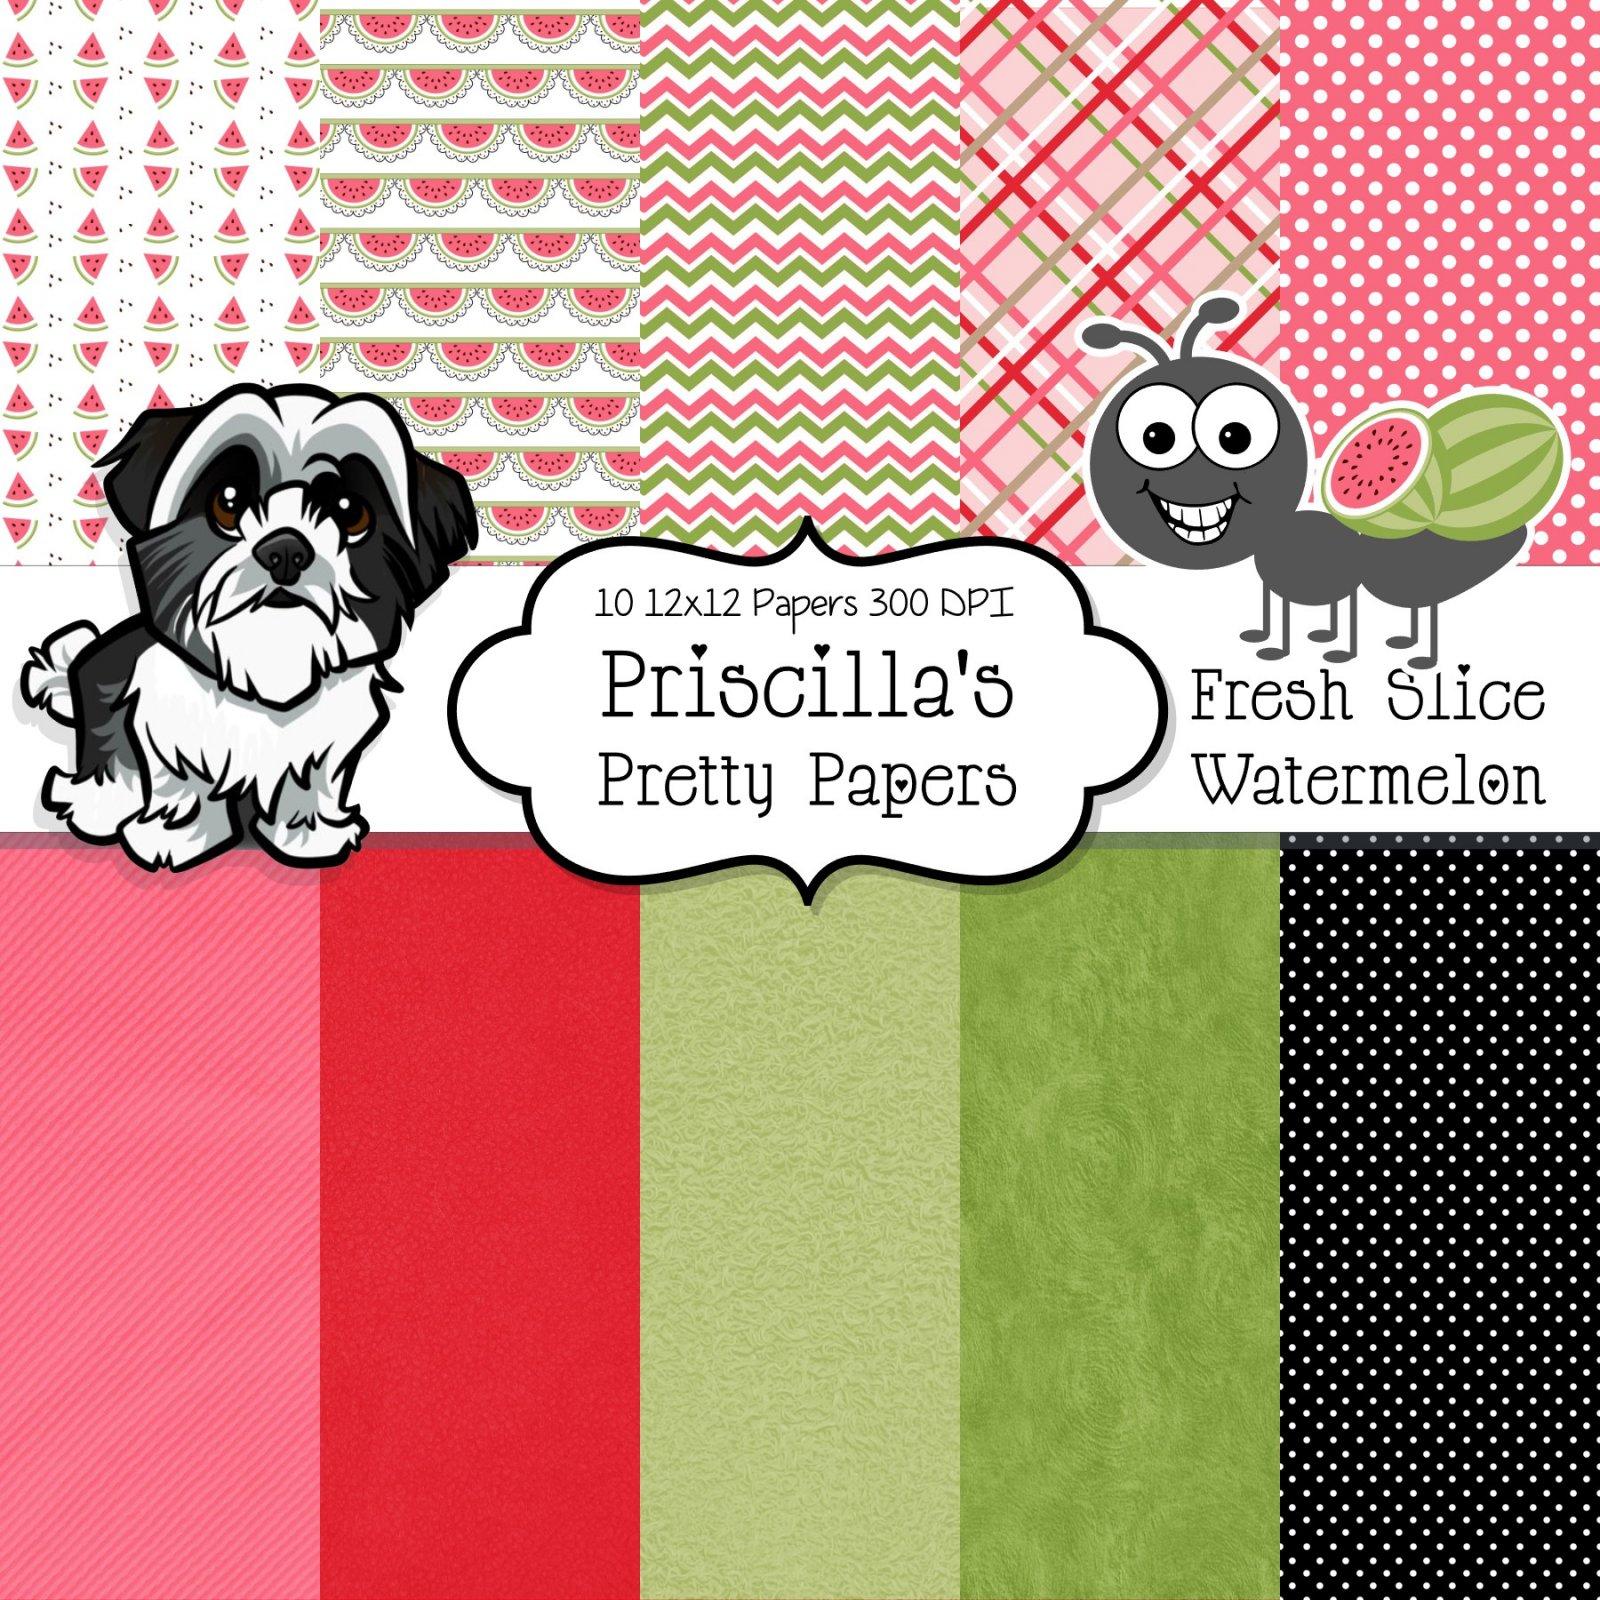 Fresh Slice - Watermelon digital paper and clipart